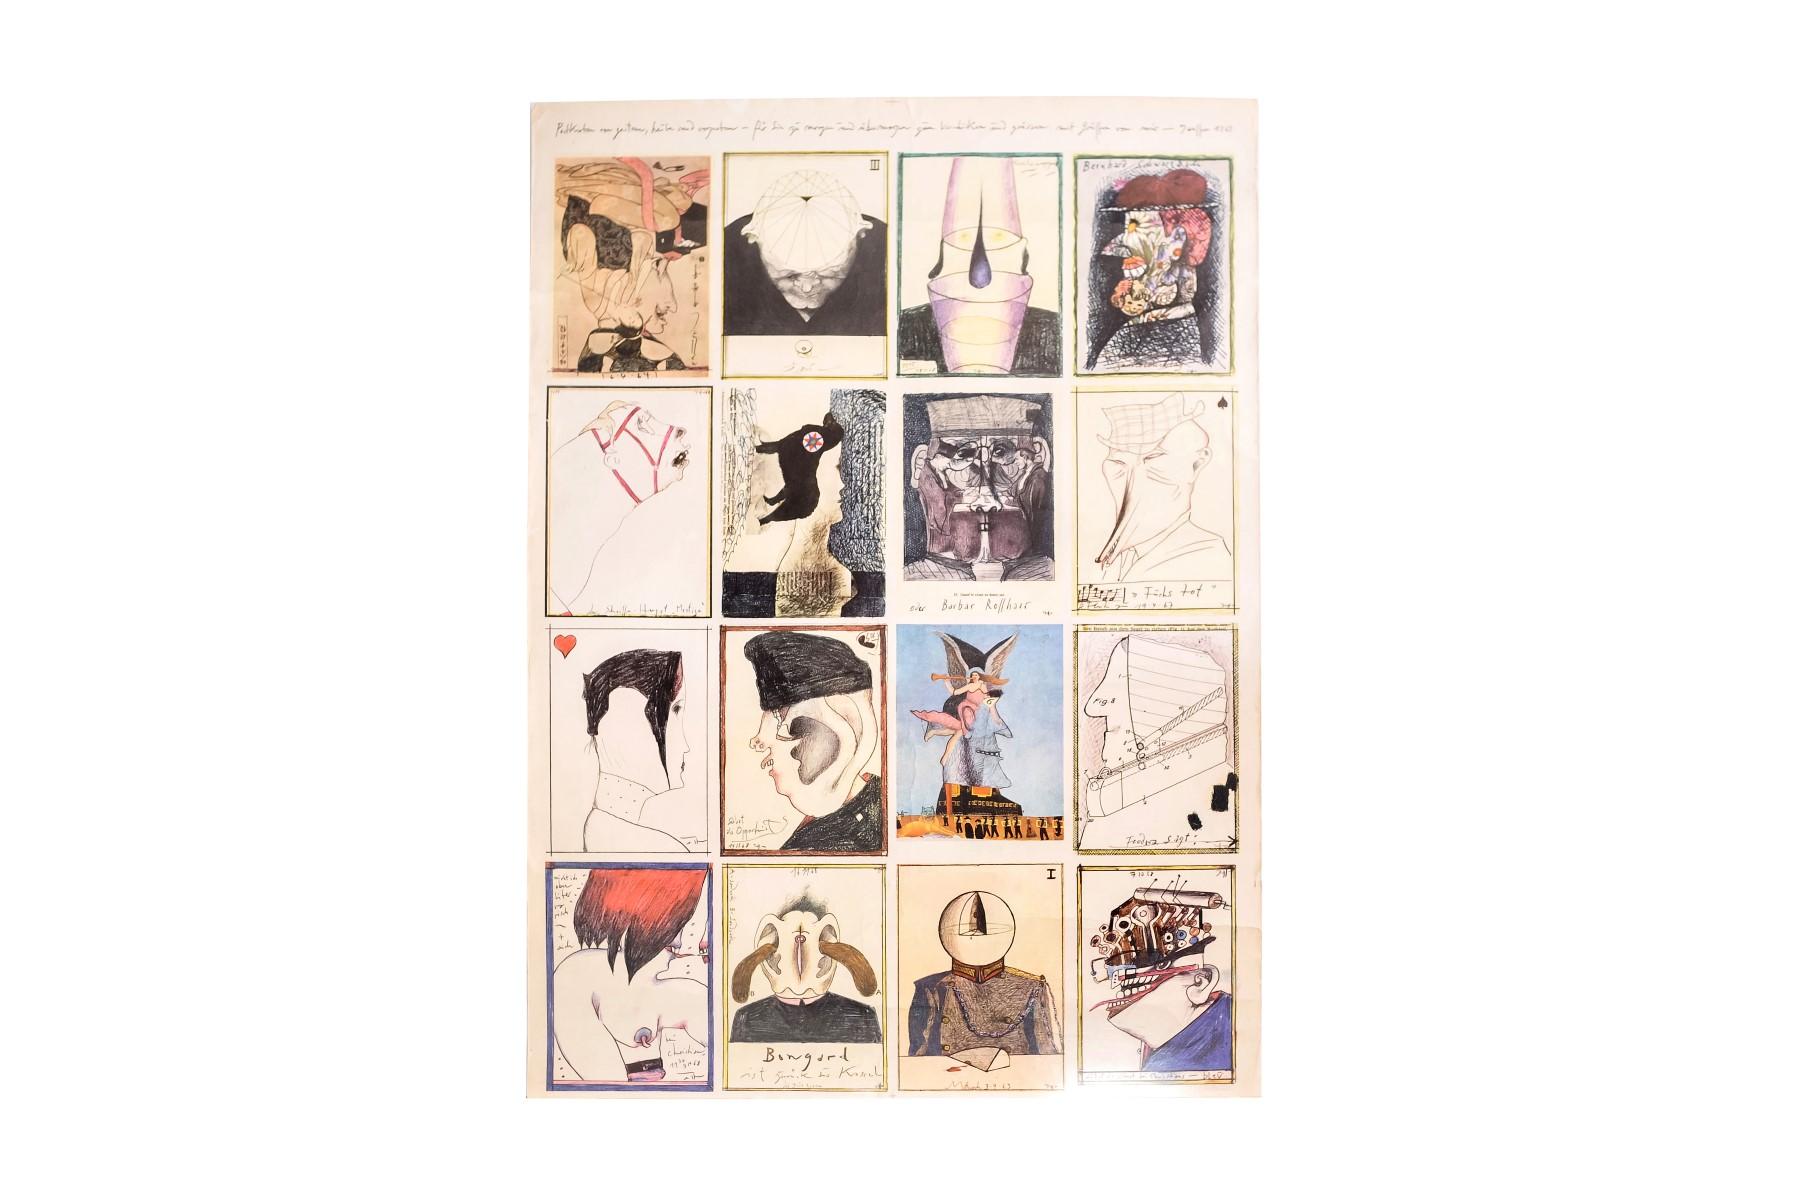 #12 Artists of the 20th Century, Postcards | Künstler des 20. Jahrhundert, Postkarten Image